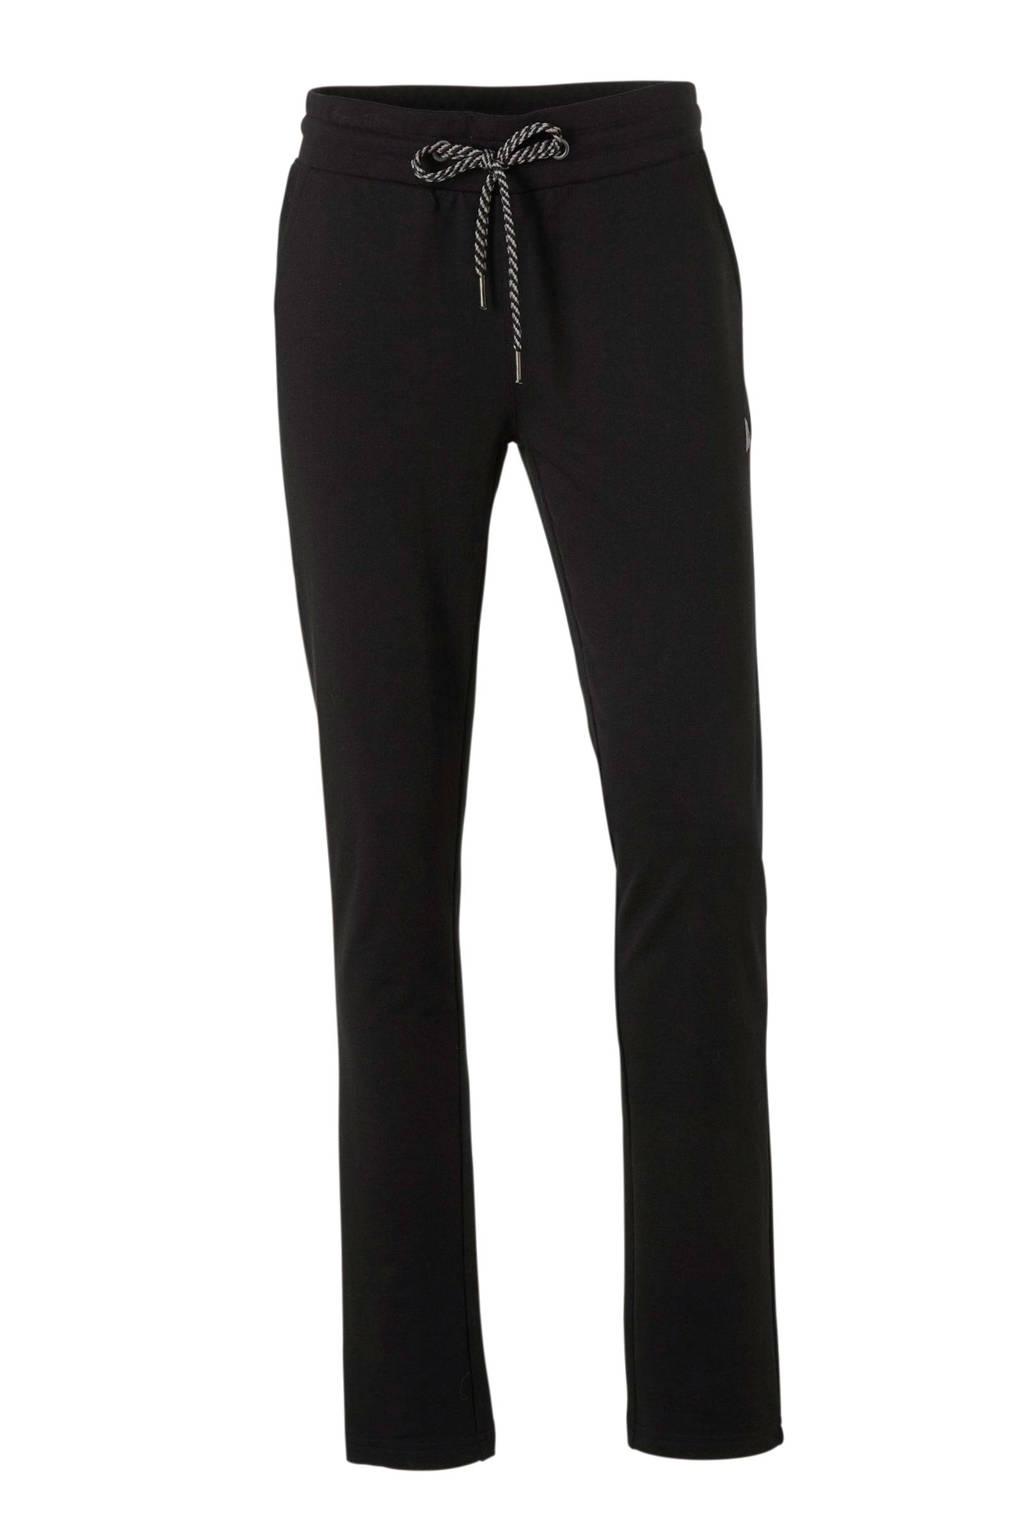 Donnay joggingbroek zwart, Zwart